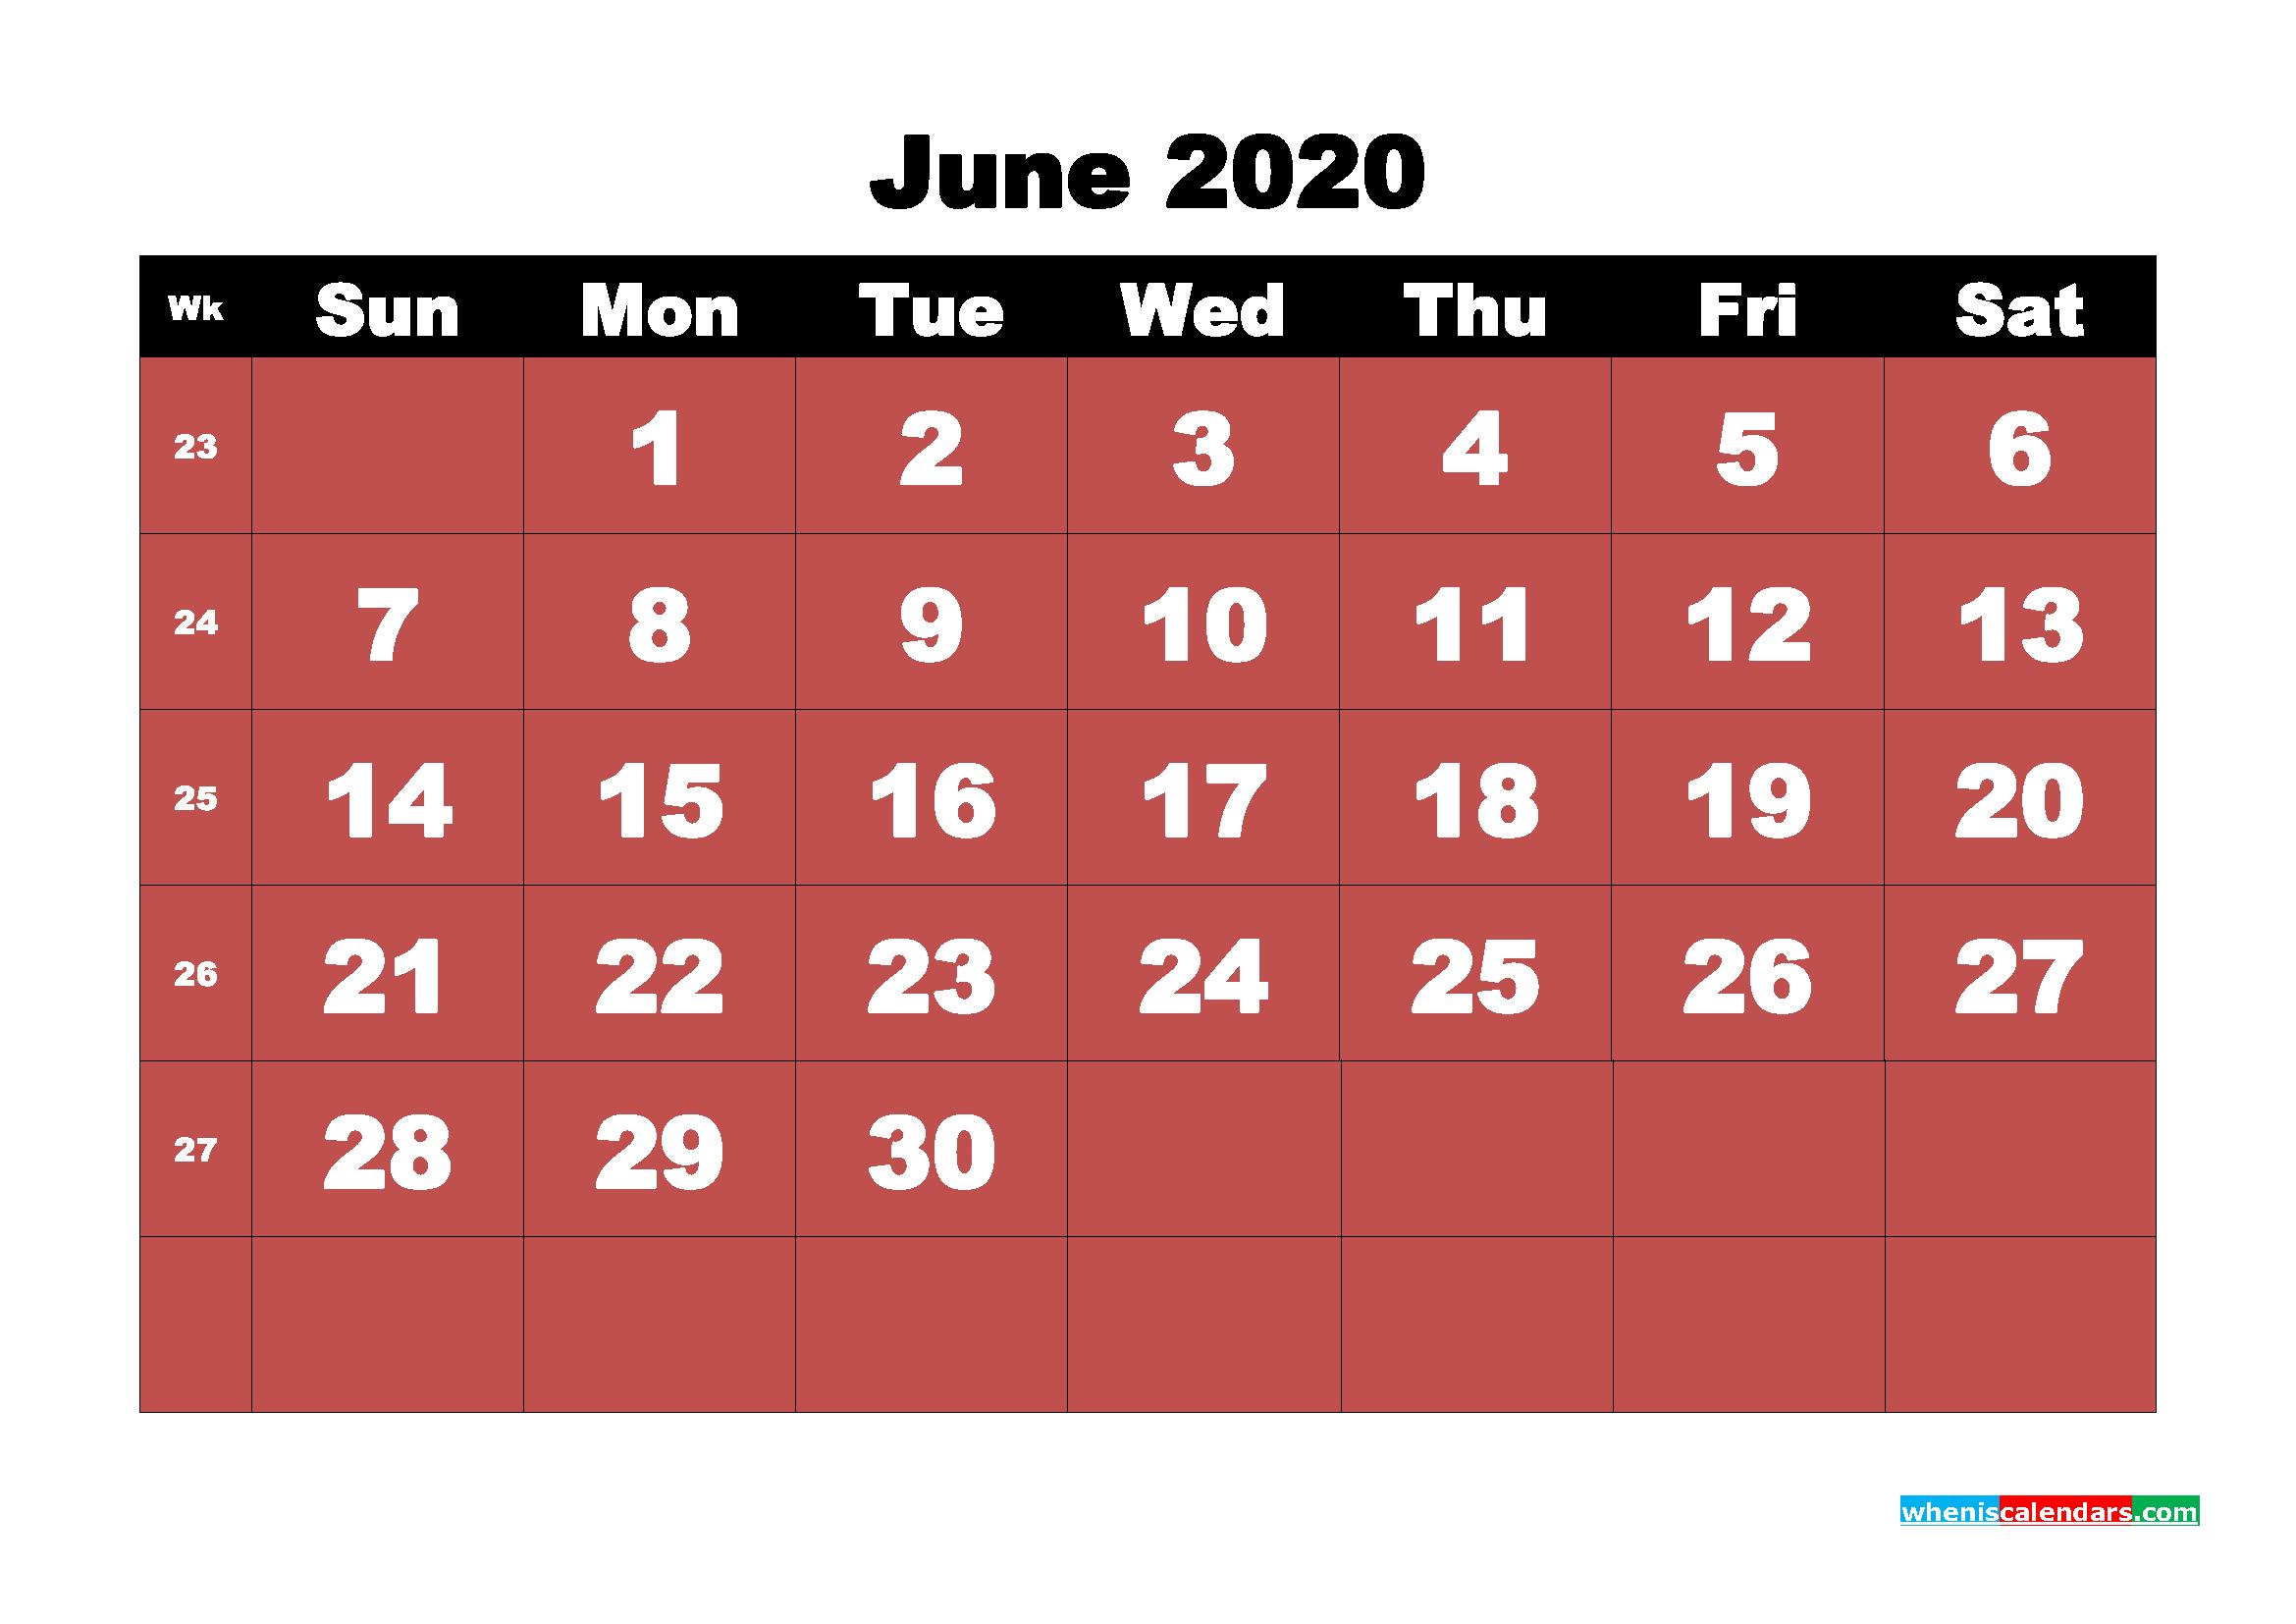 June Printable Calendar 2020 PDF, Word - No.m20b18